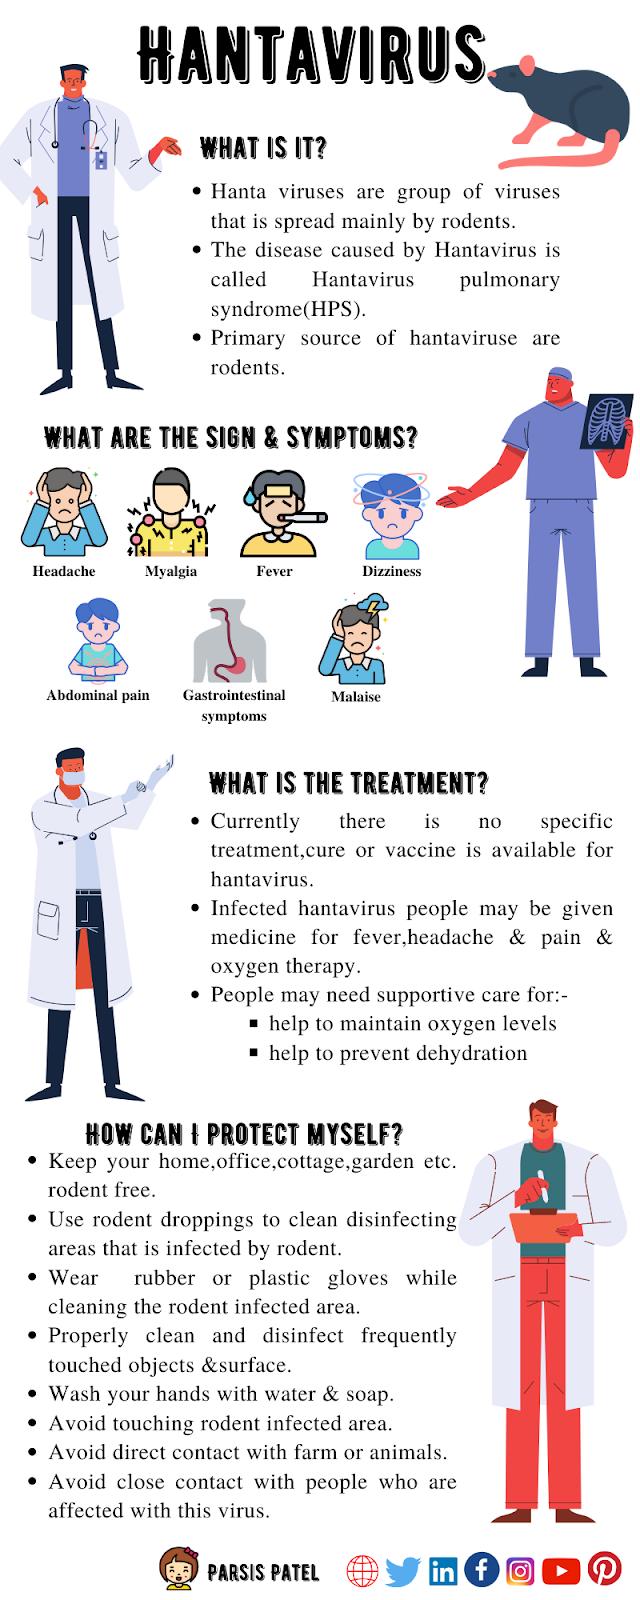 Hantavirus Pulmonary Syndrome | Treatment,Vaccine,Map,Symptoms,News